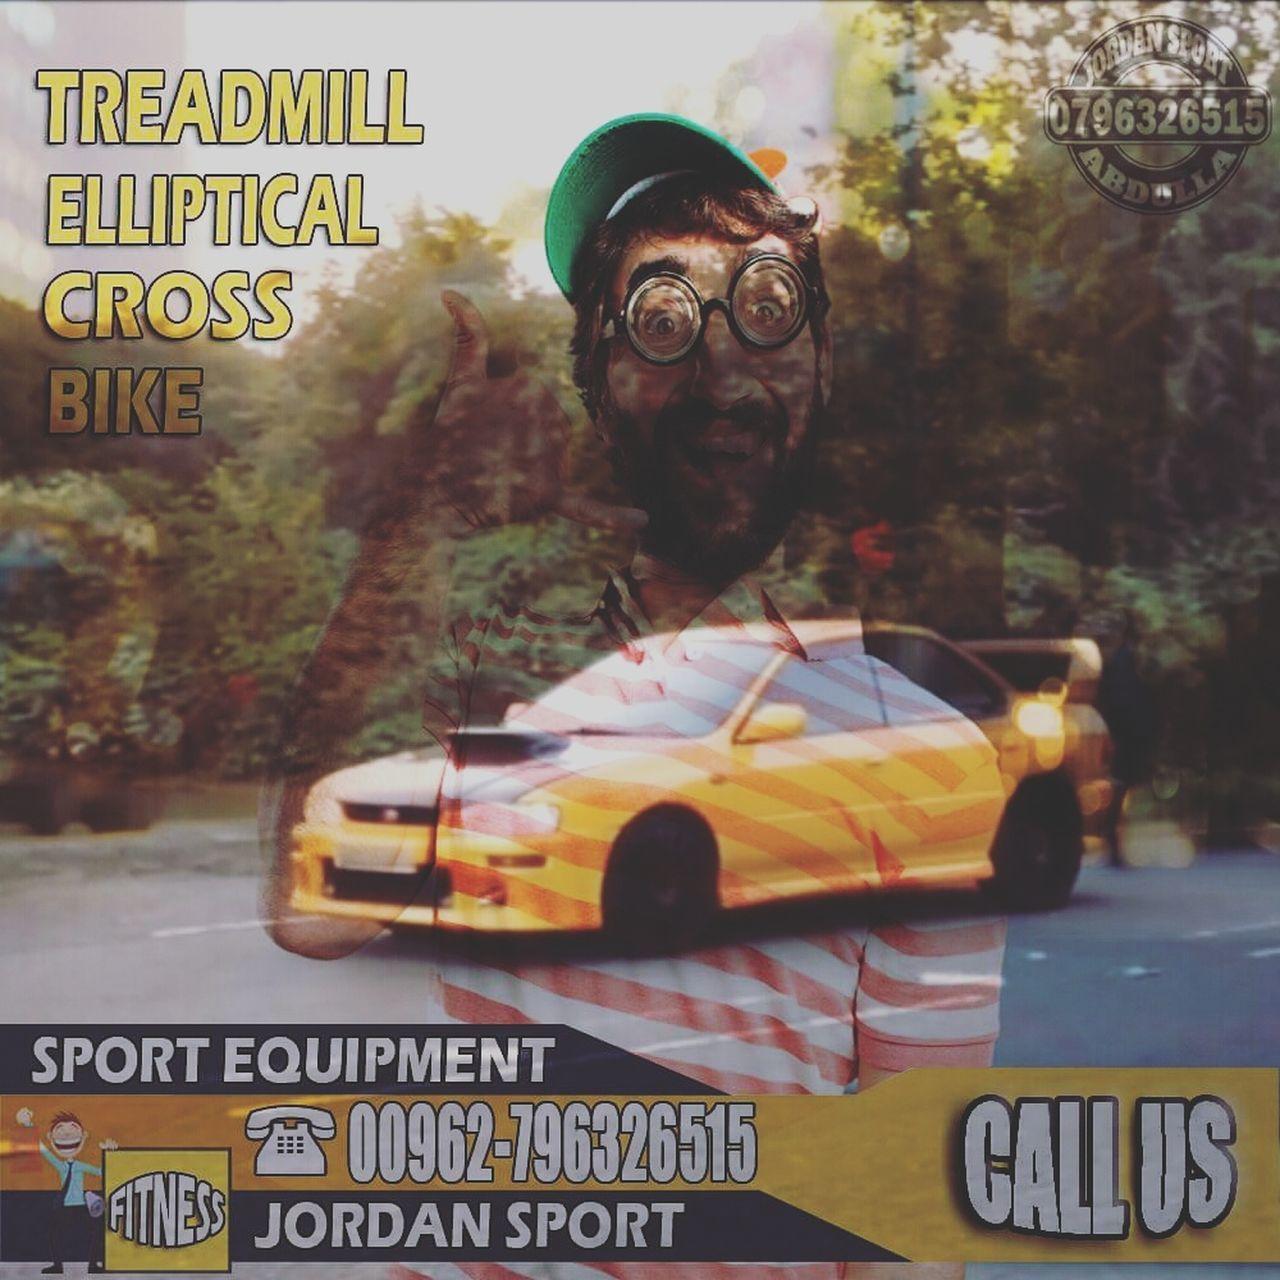 Sport Equipment Amman Jordan Amman, Jordan Jordanian Treadmill Elliptical Cardio Fitness Home Fitness